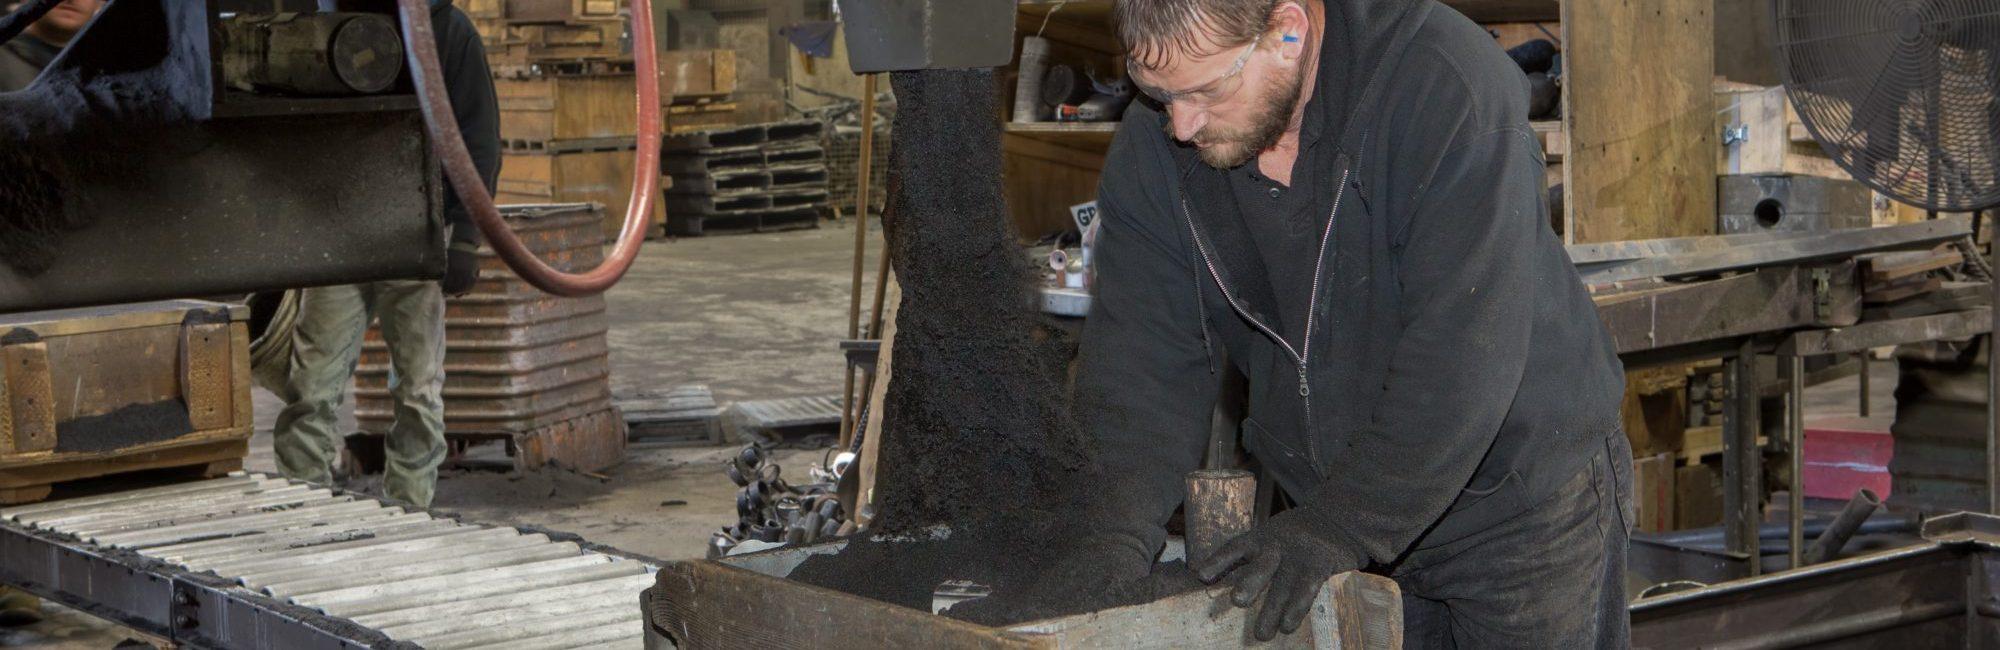 custom iron casting molding